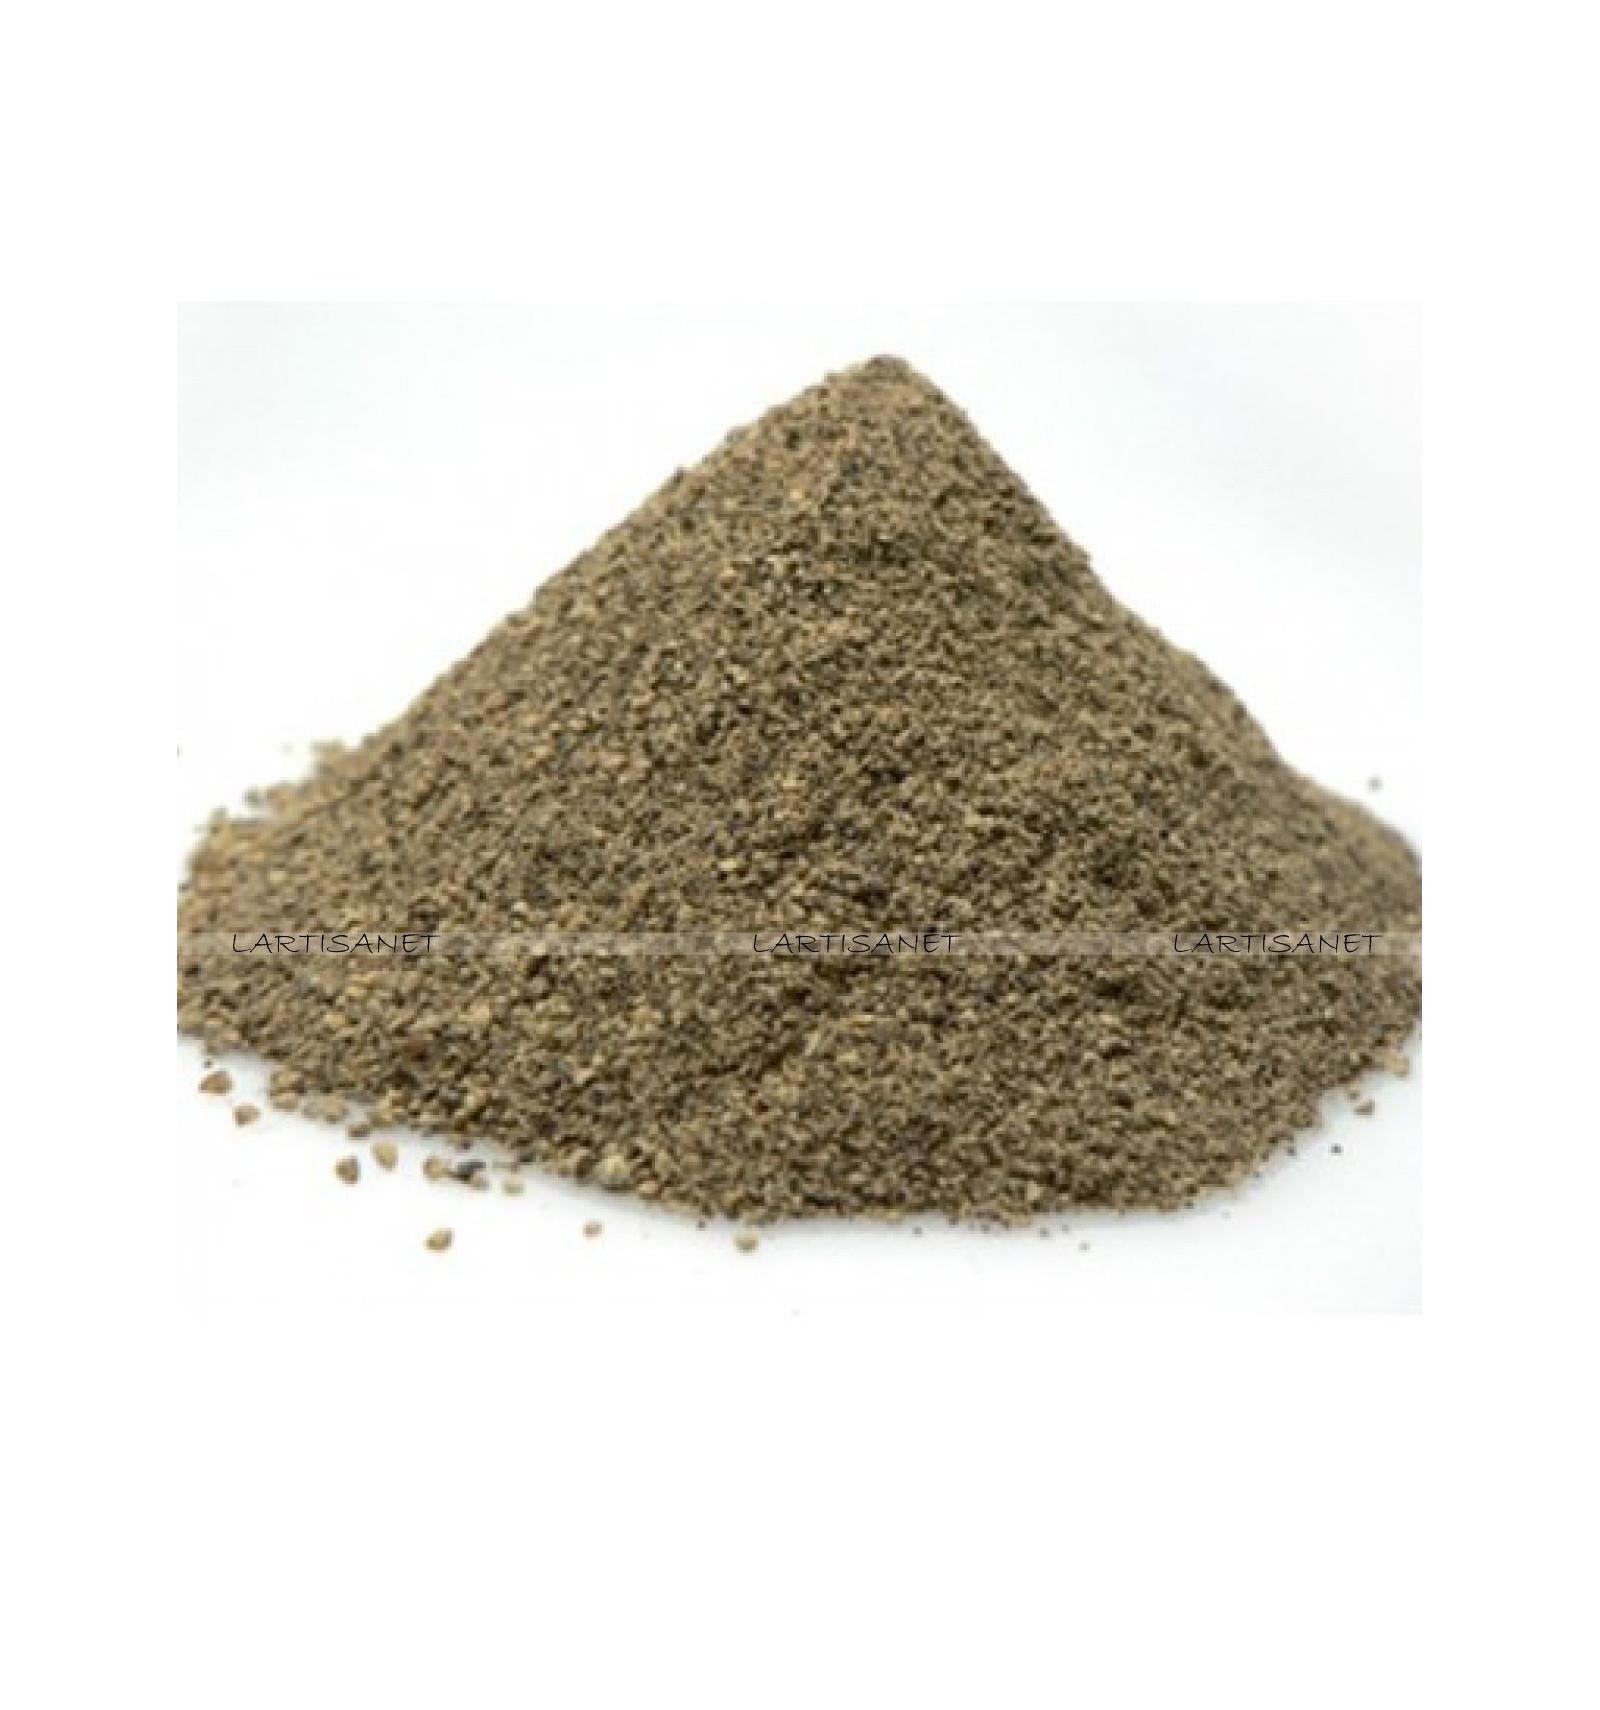 Poivre noir moulu - Lartisanet